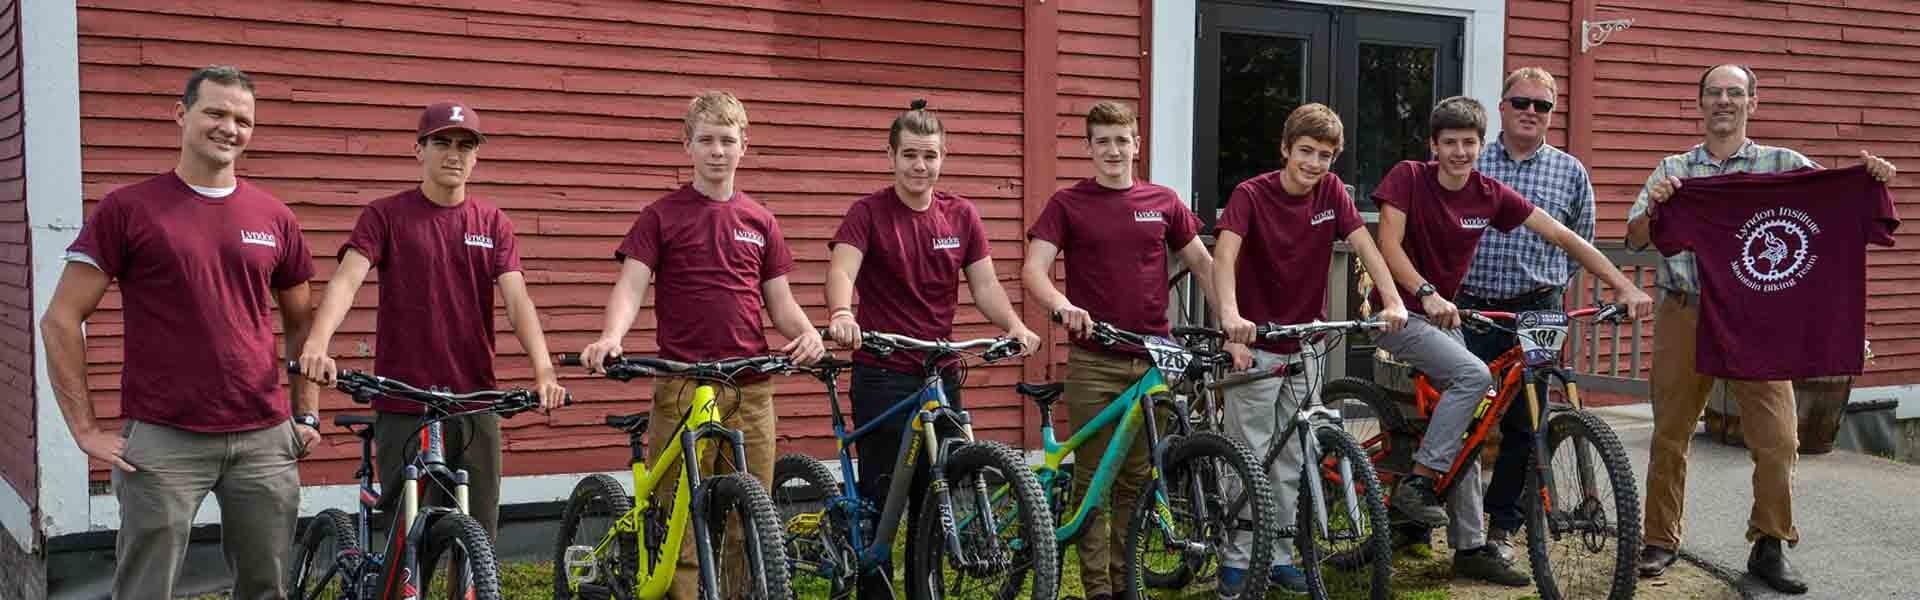 Lyndon Vermont USA Bikers Banner 2019